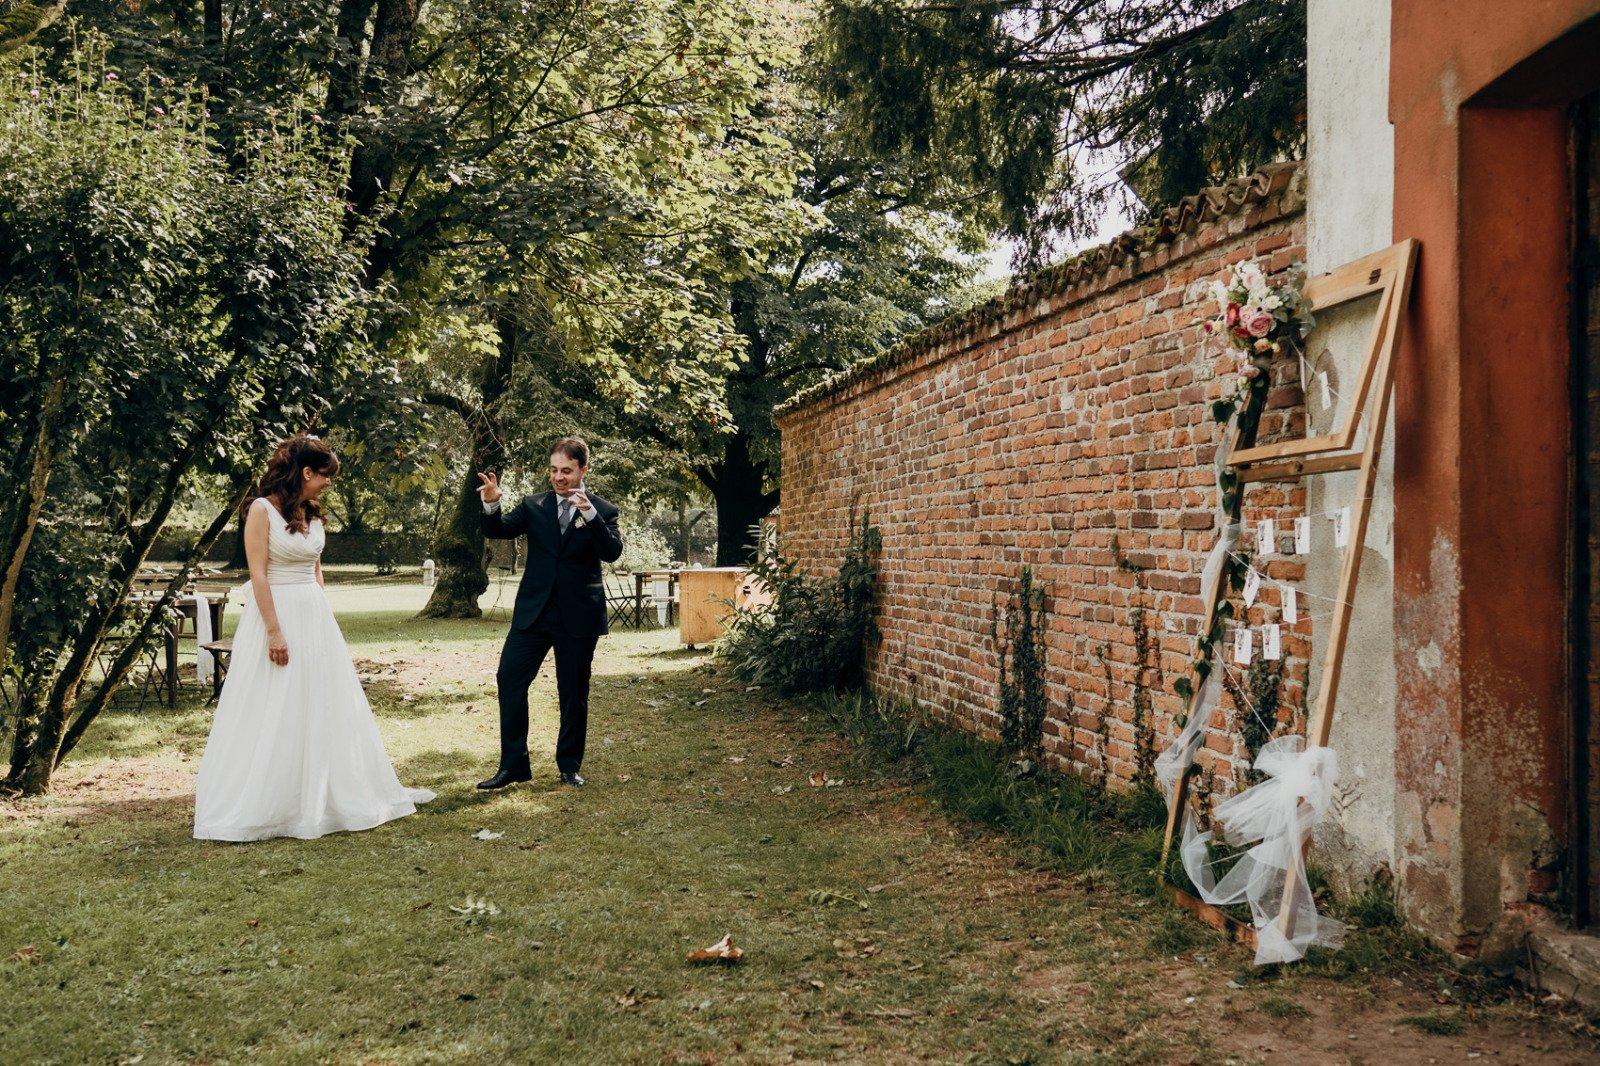 Matrimonio autunnale_65